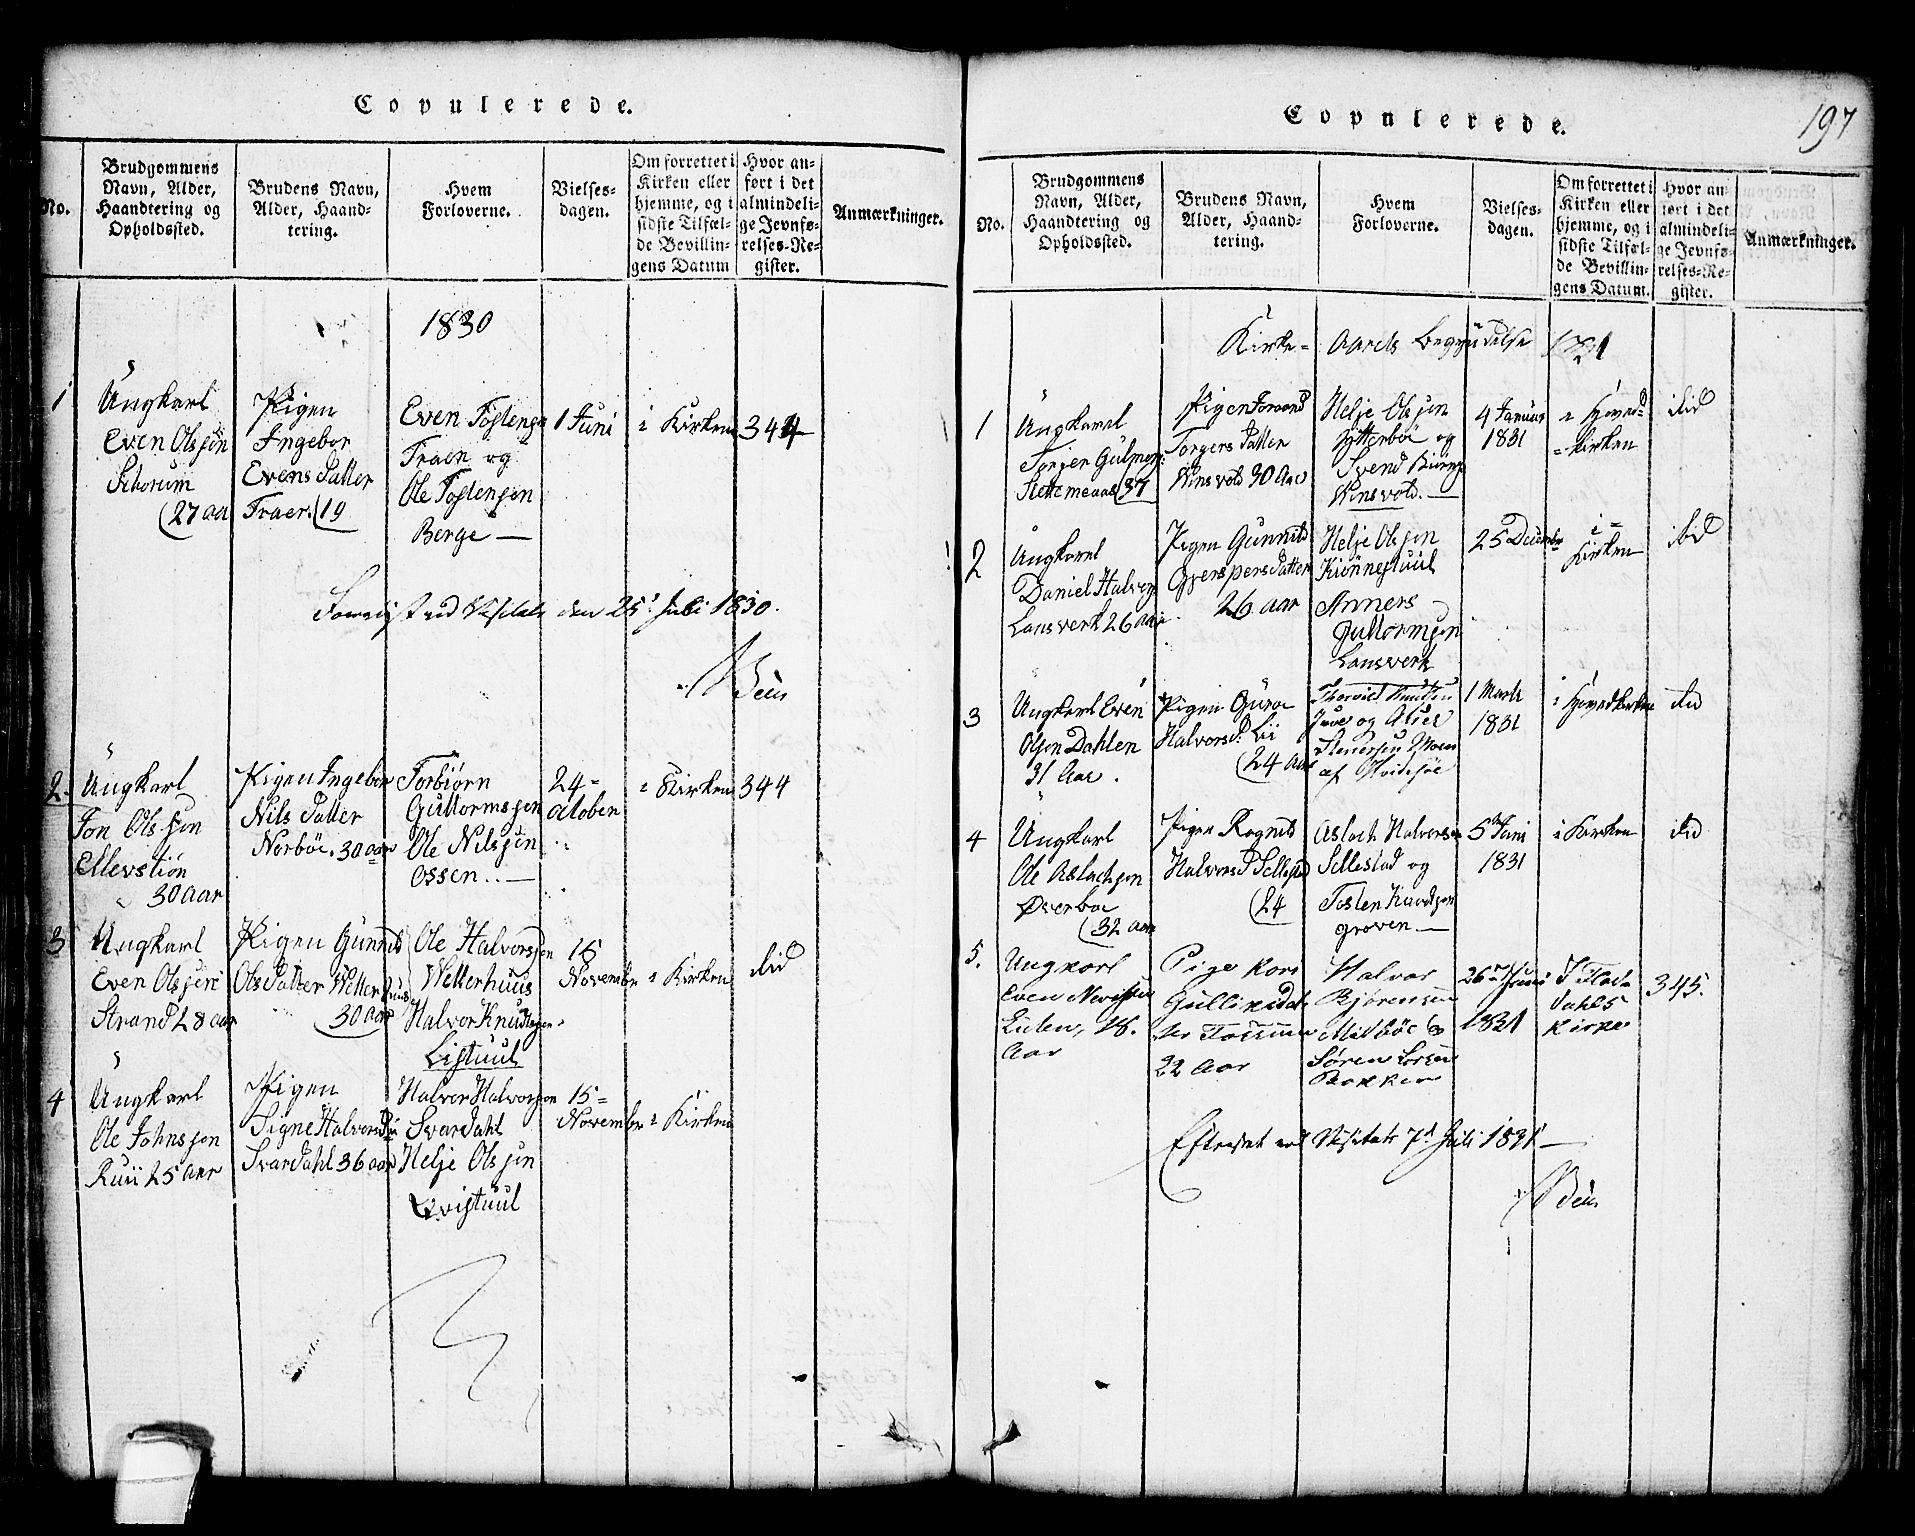 SAKO, Seljord kirkebøker, G/Gc/L0001: Klokkerbok nr. III 1, 1815-1849, s. 197